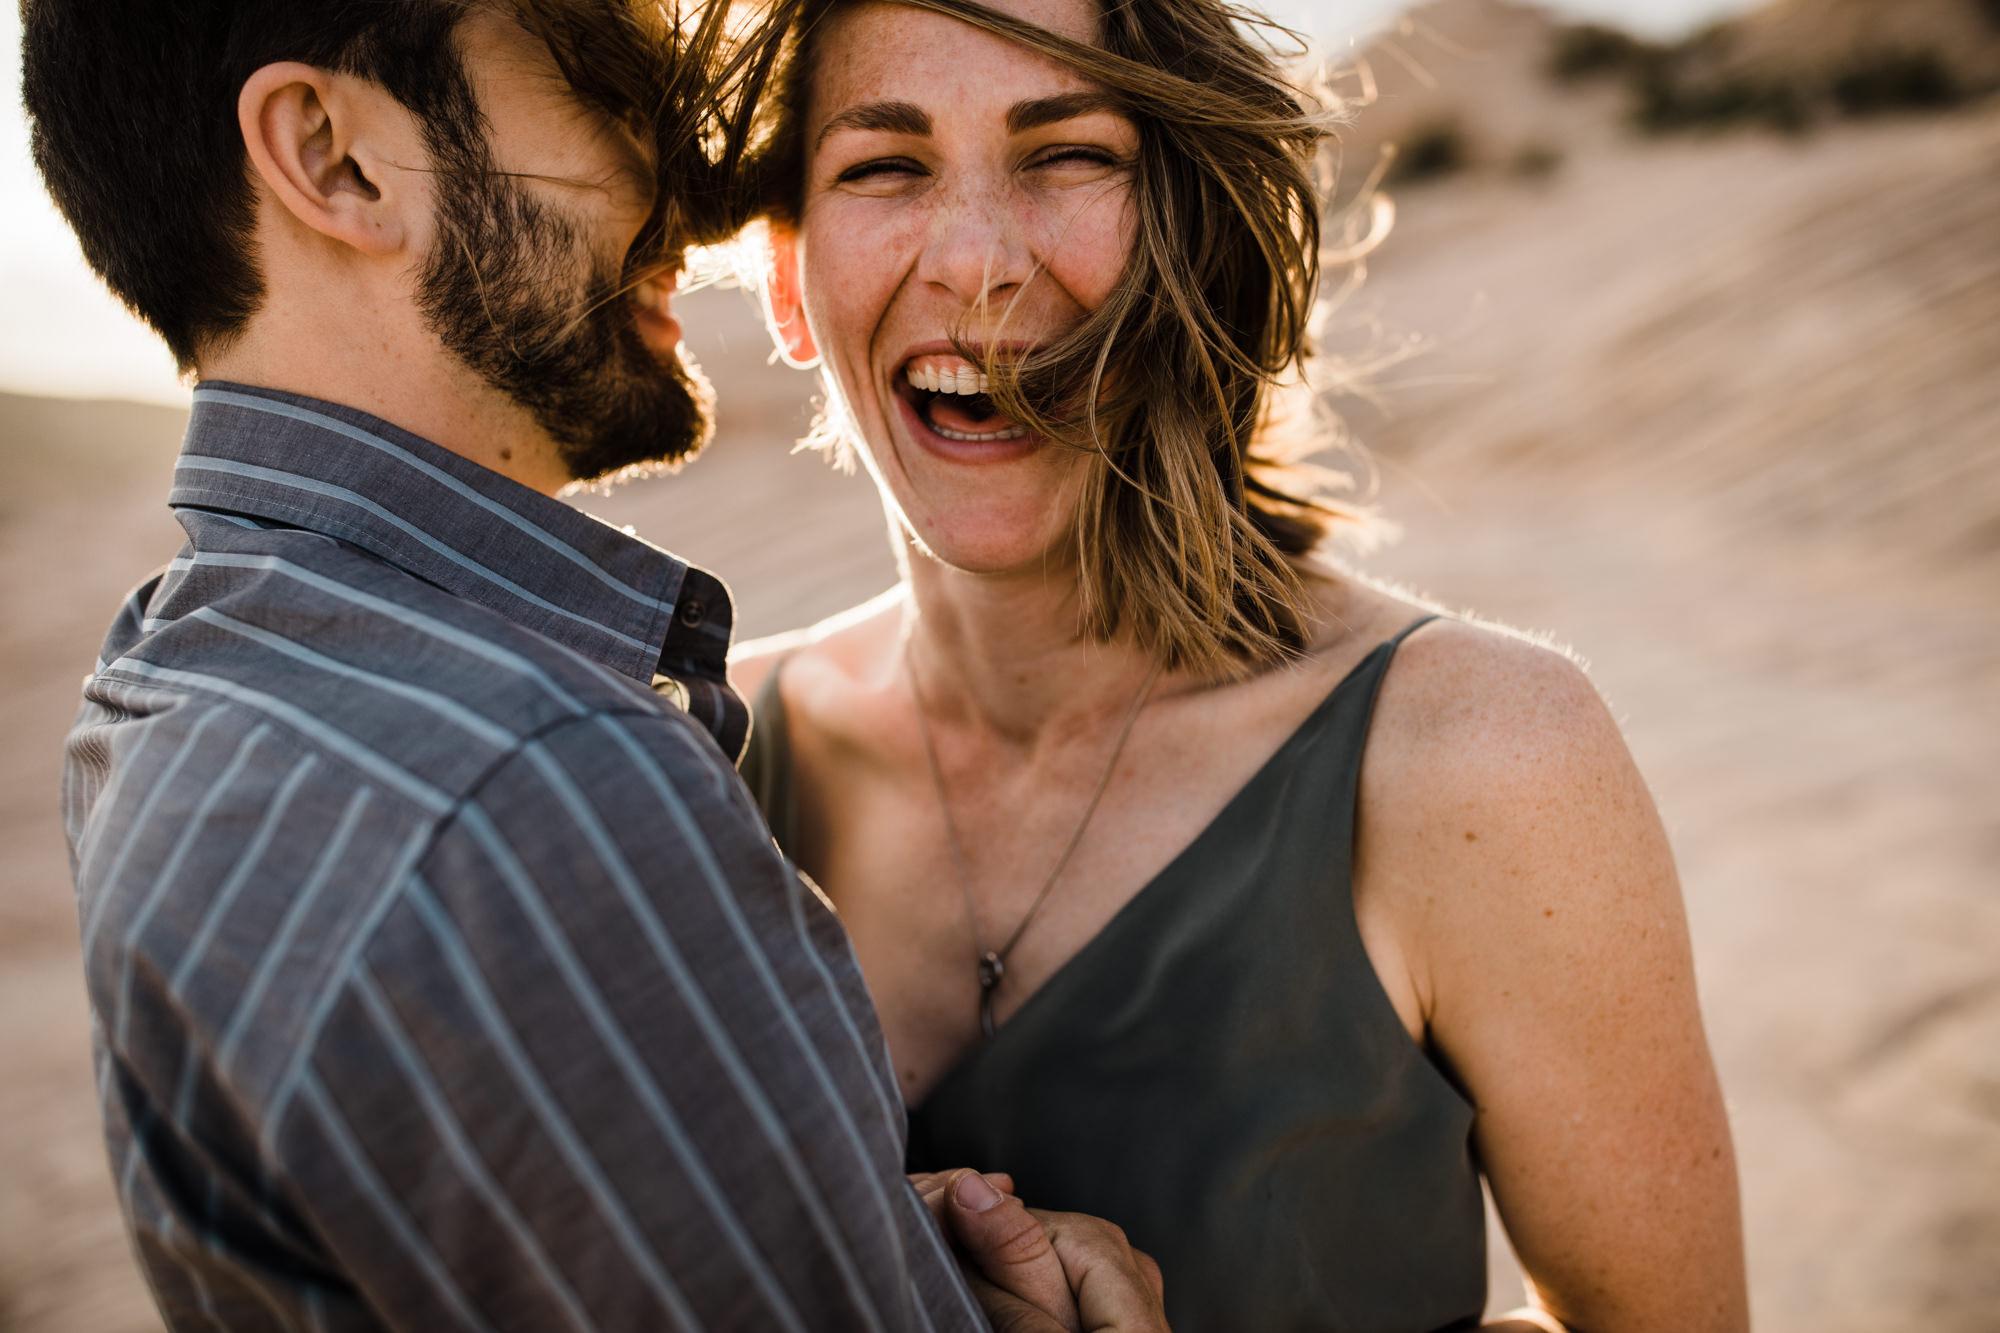 windy utah desert engagement session | destination engagement photo inspiration | utah adventure elopement photographers | the hearnes adventure photography | www.thehearnes.com